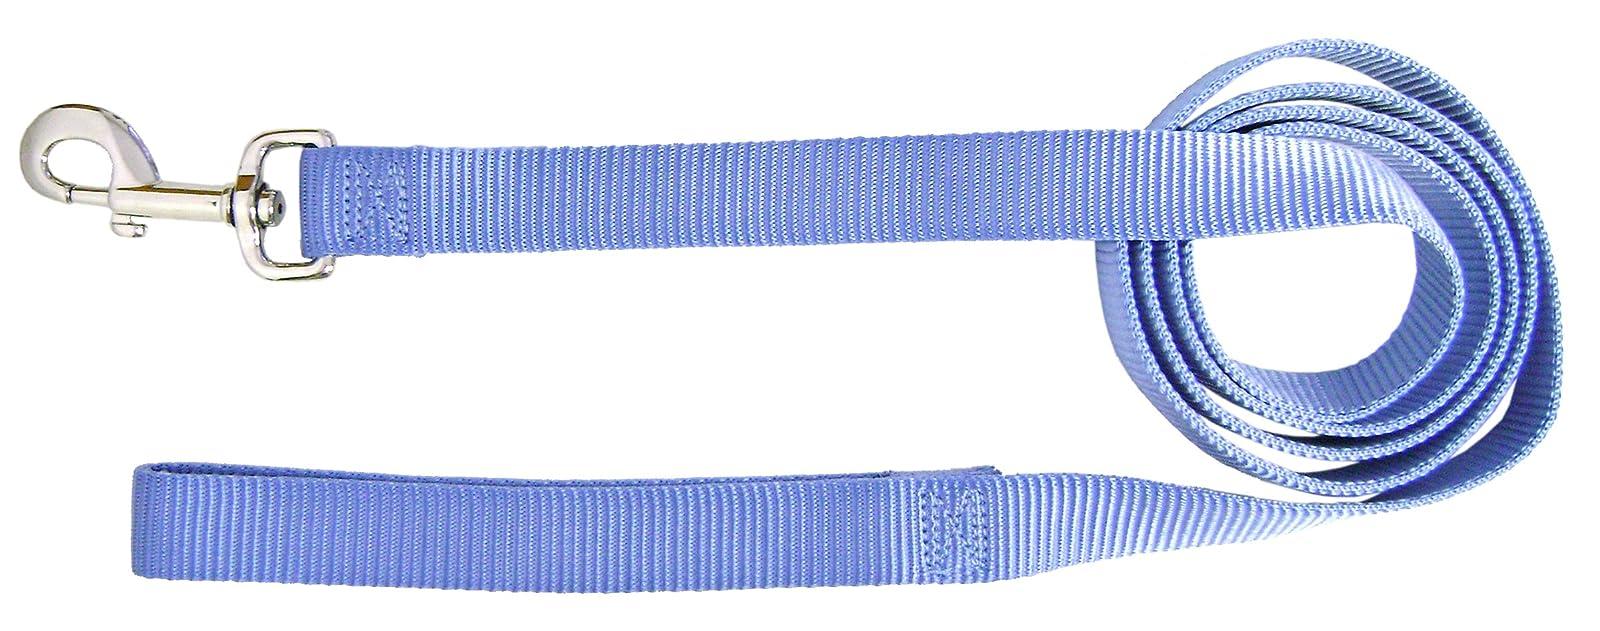 Hamilton Single Thick Nylon Dog Lead 1- SLO 6BY Berry Blue - 1